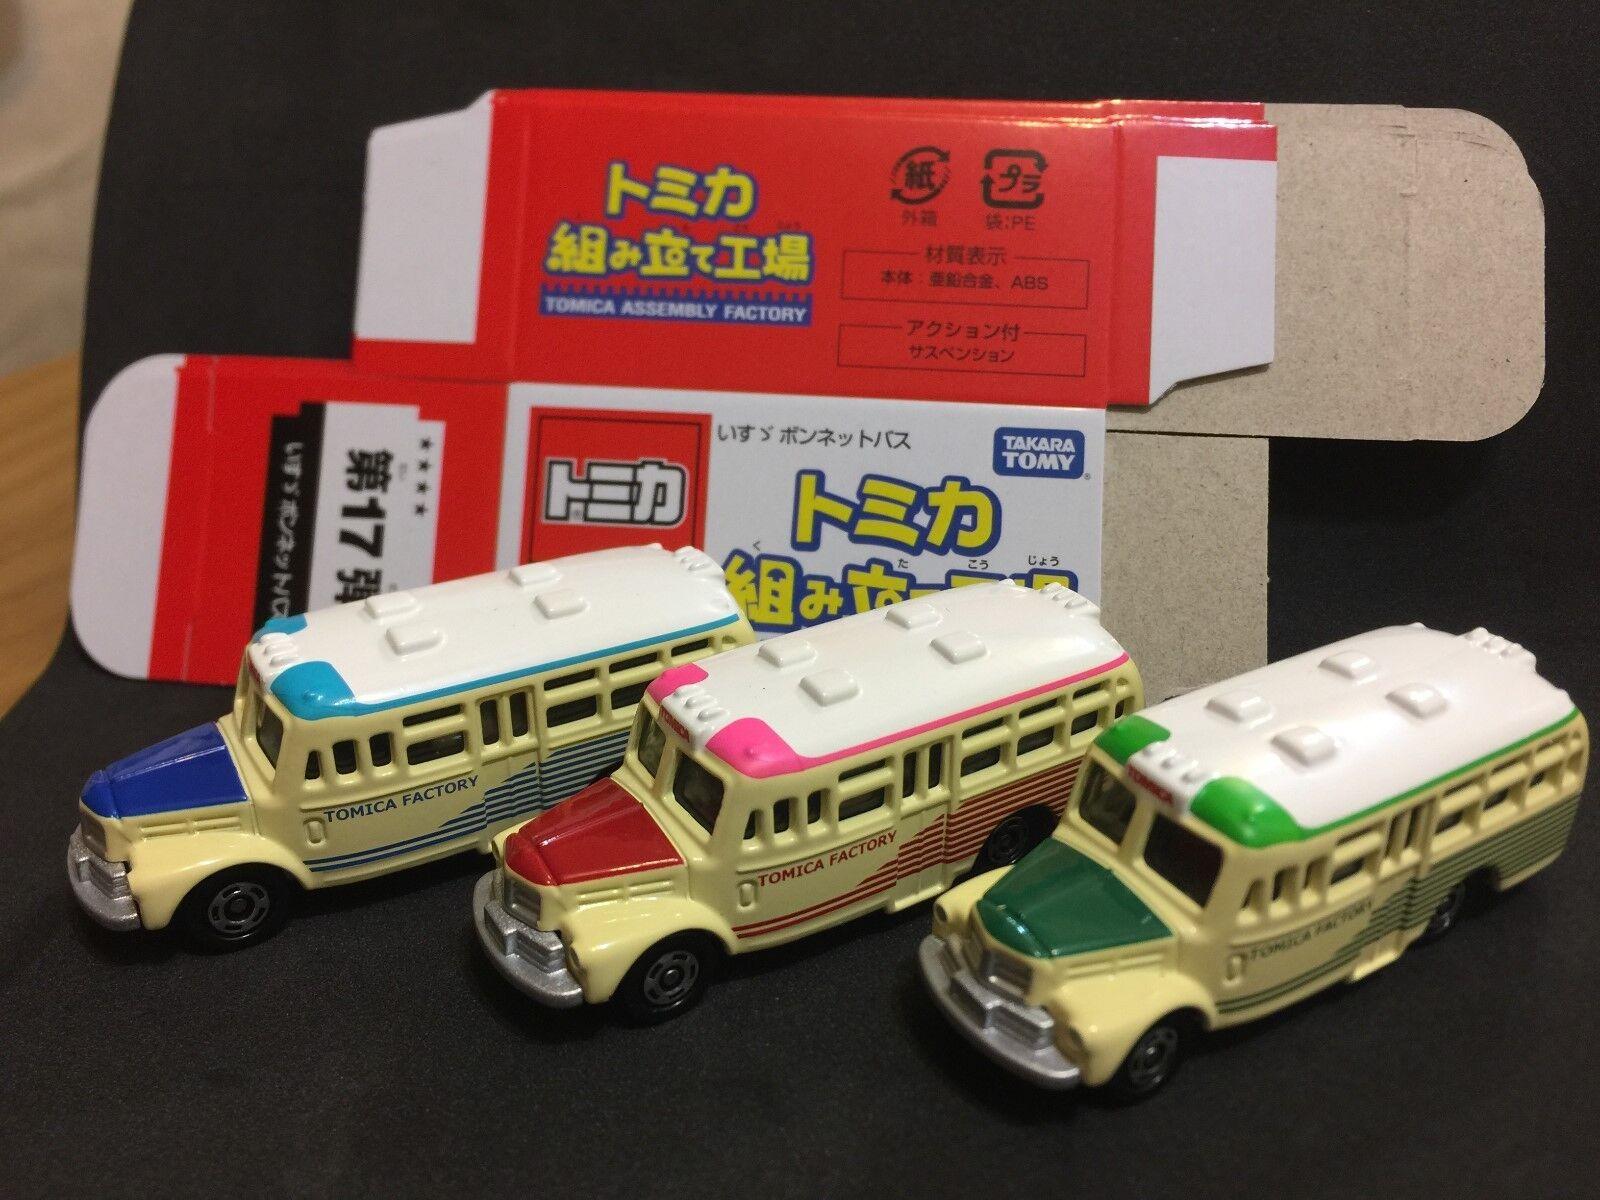 Tomica Assembly Factory Vol 17 Isuzu Bonnet Bus set of 3 Mint w box